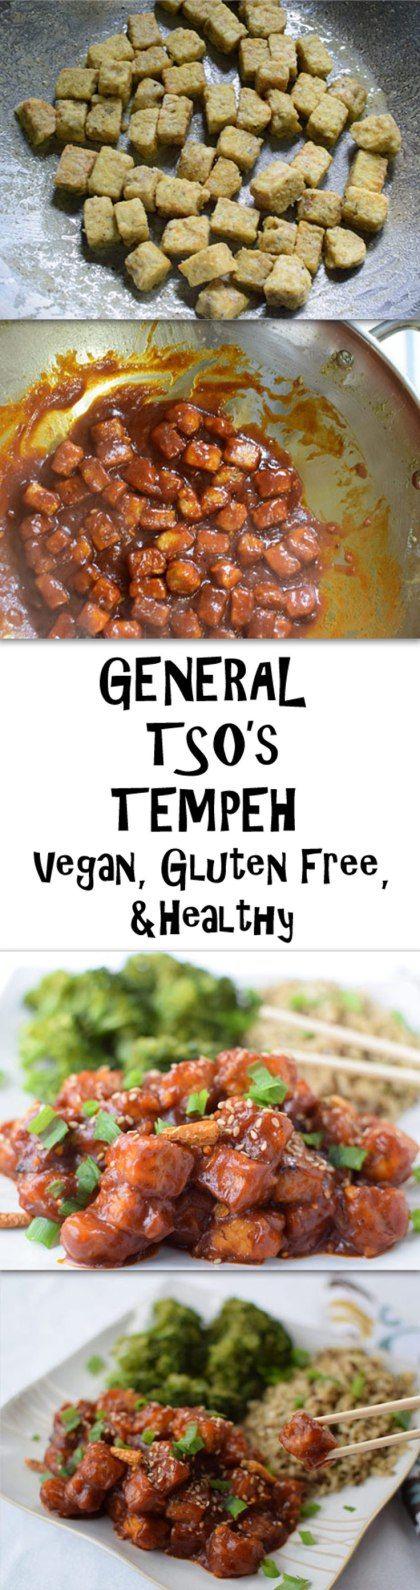 General Tso's Tempeh